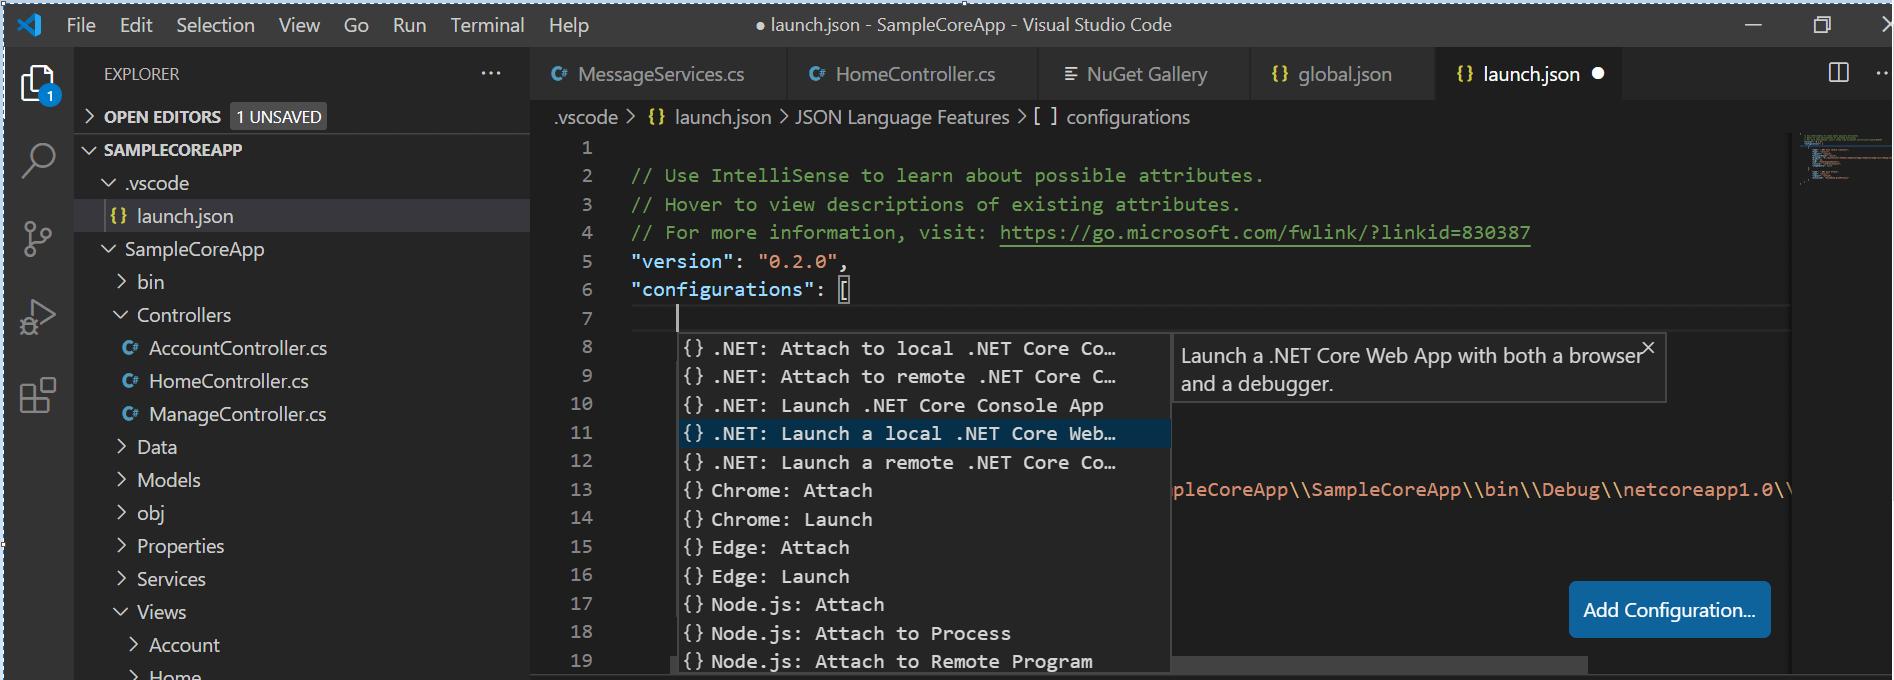 select the .NET Core Launch (web) configuration